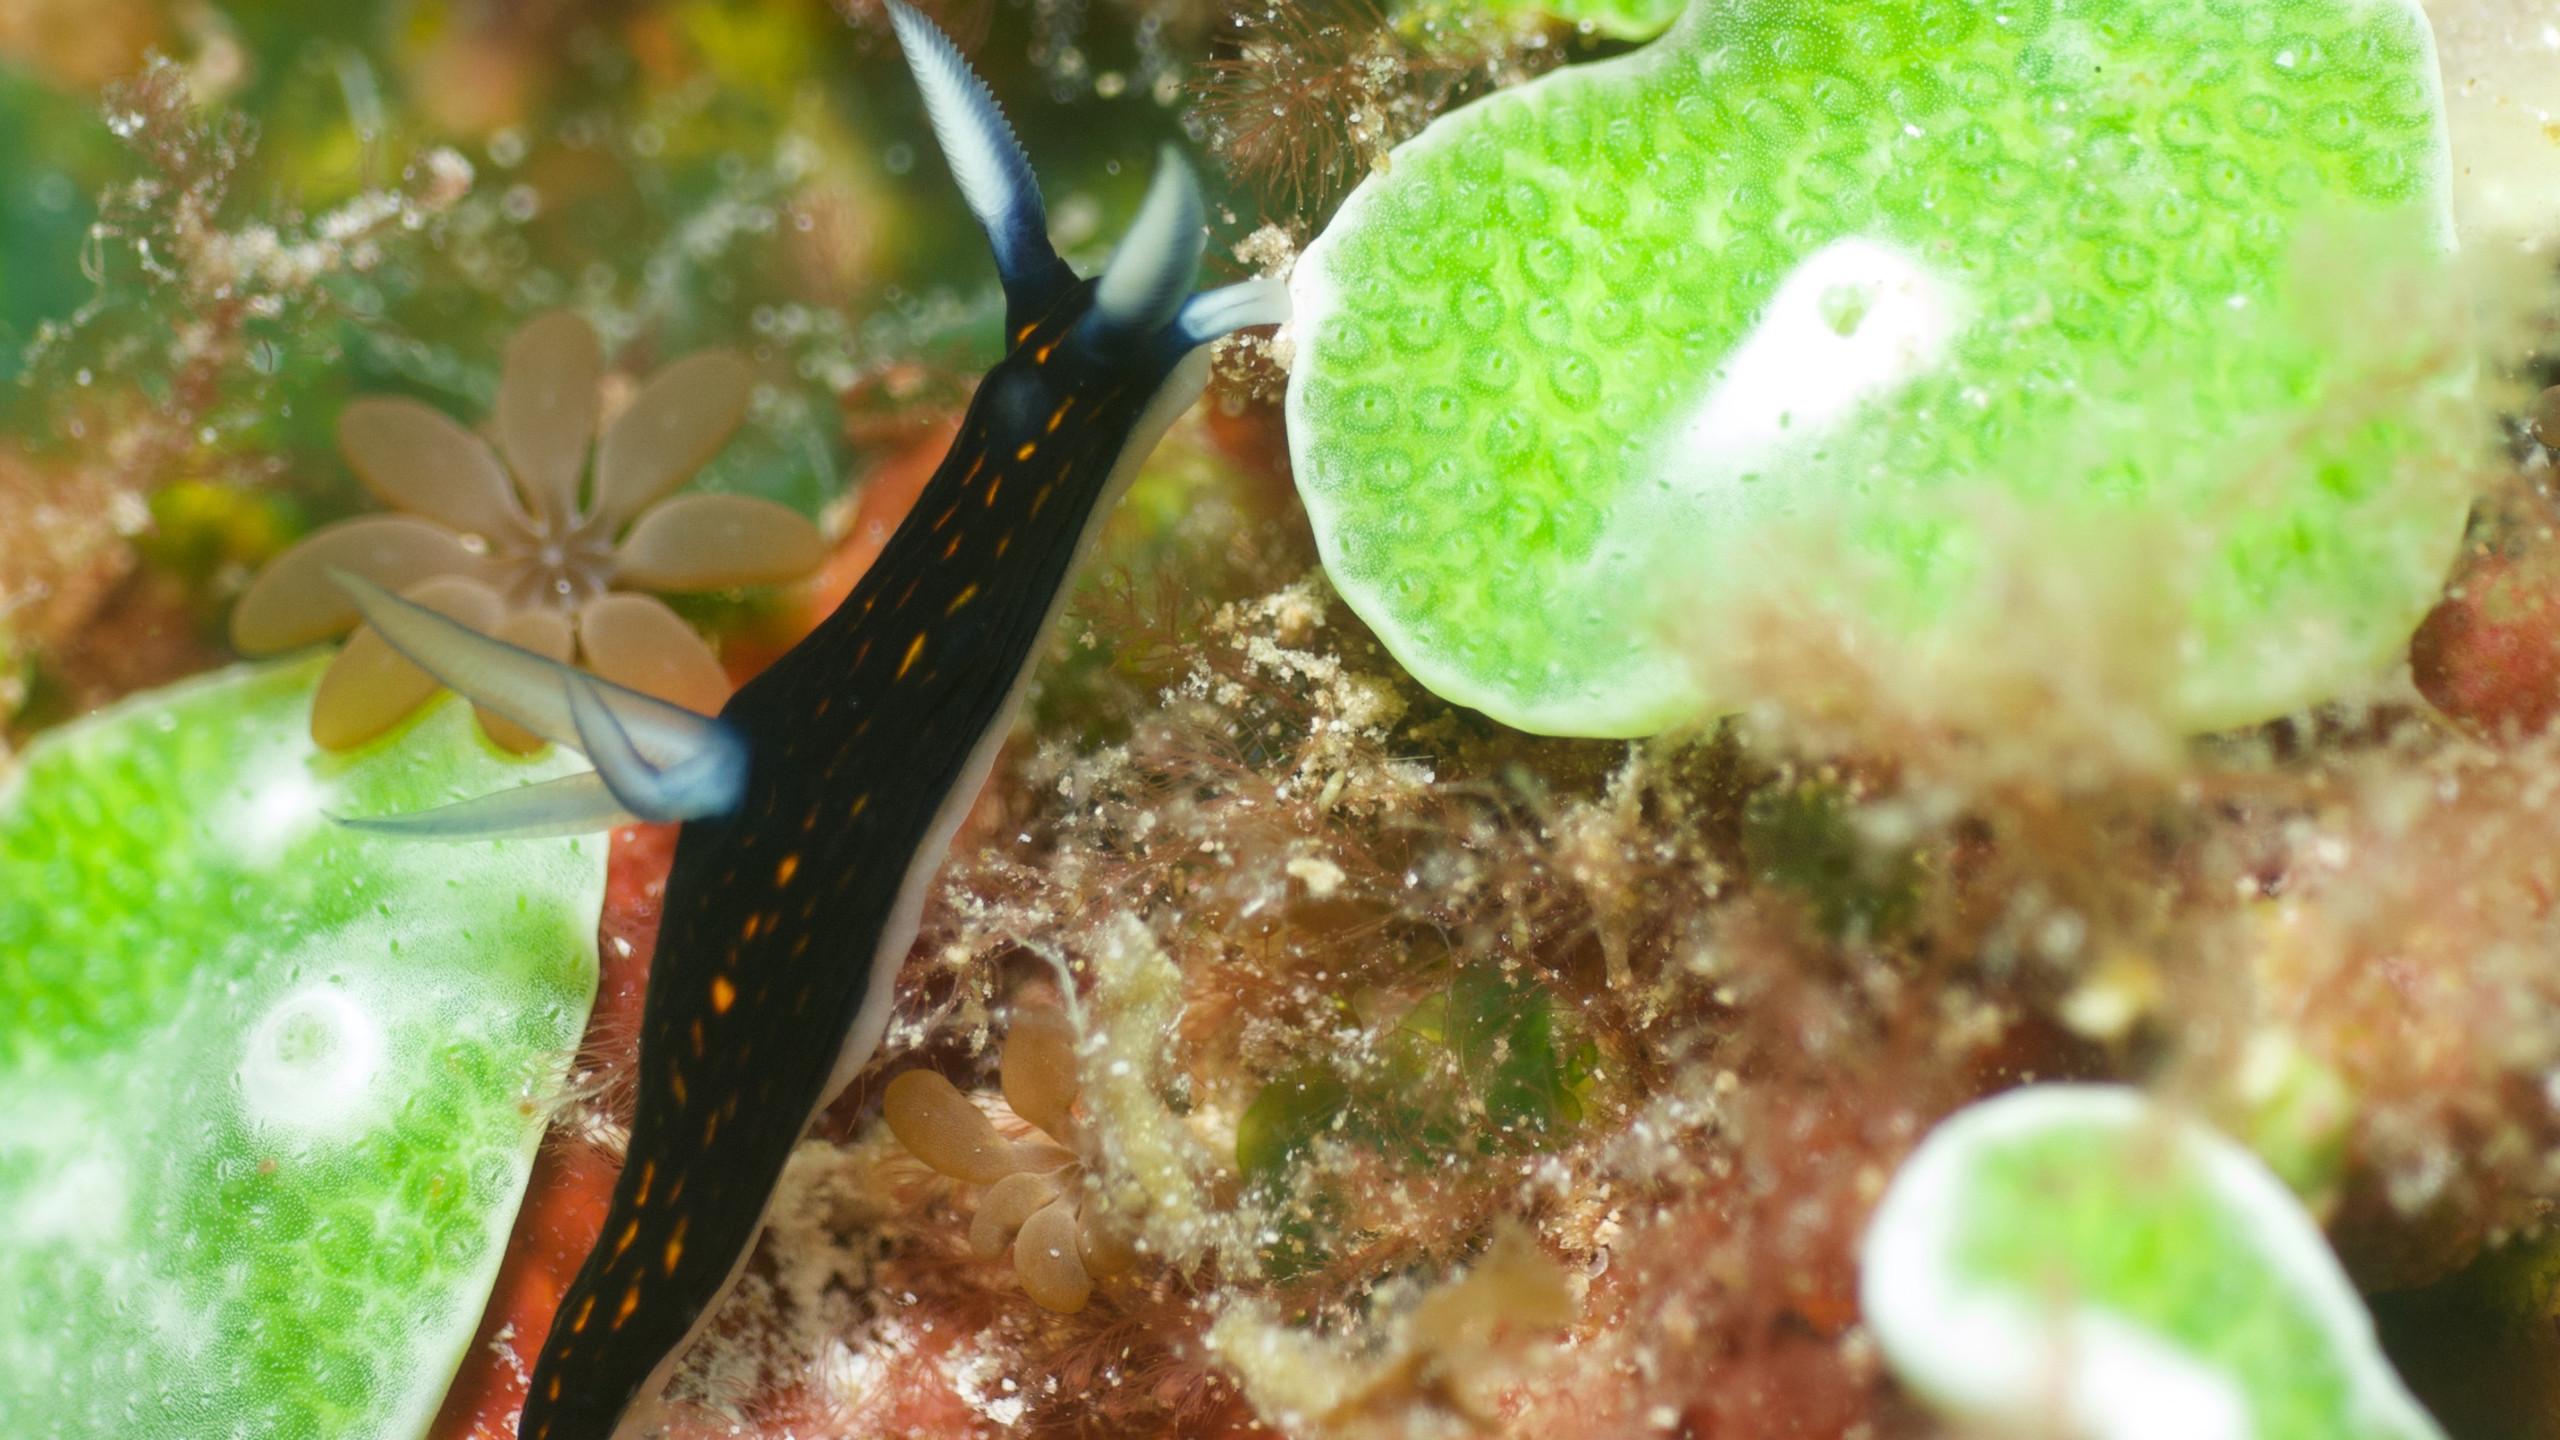 Nudibranch, credits Nima